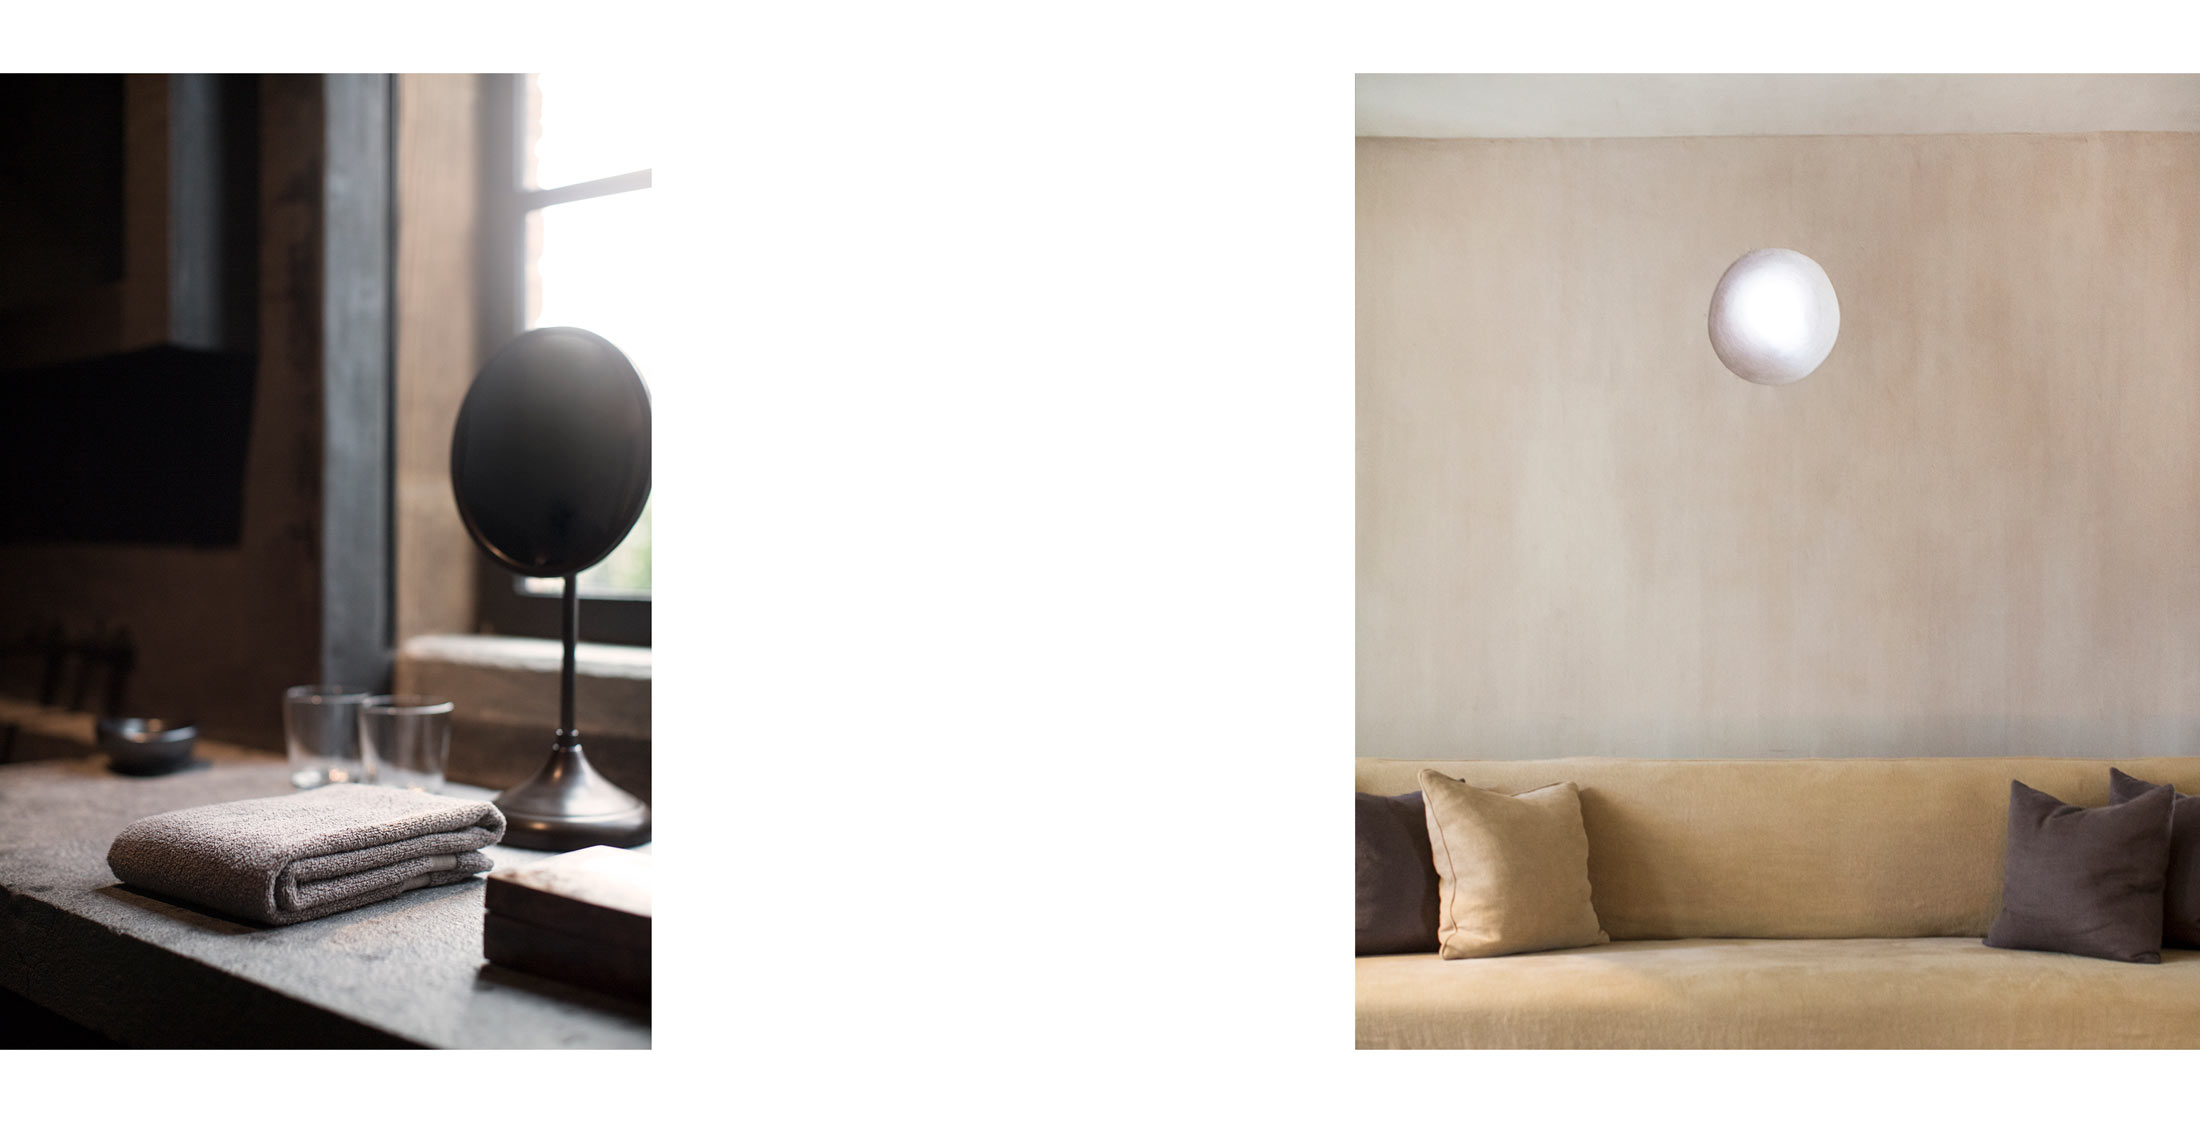 tribeca-suite_the-greenwich-hotel_NYC_erik-melvin_1.jpg